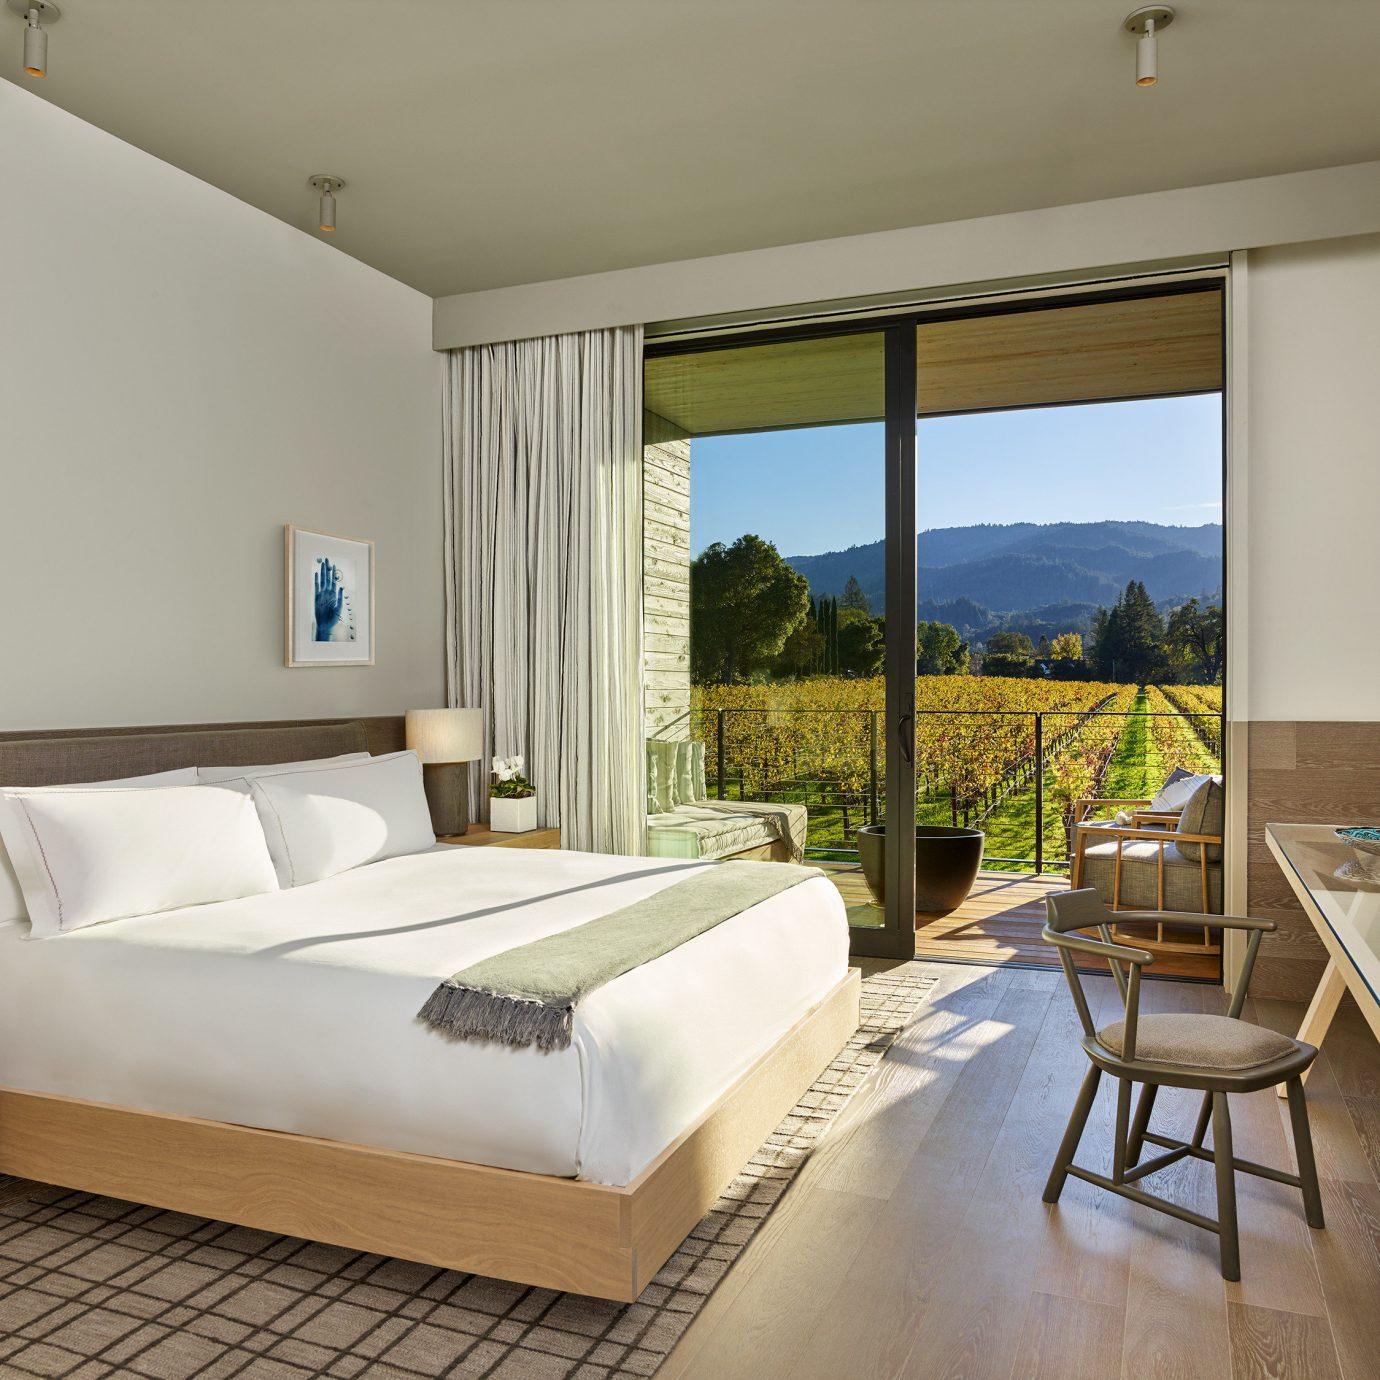 Hotels Romance Spa Retreats Trip Ideas property Suite living room Villa Bedroom home cottage condominium